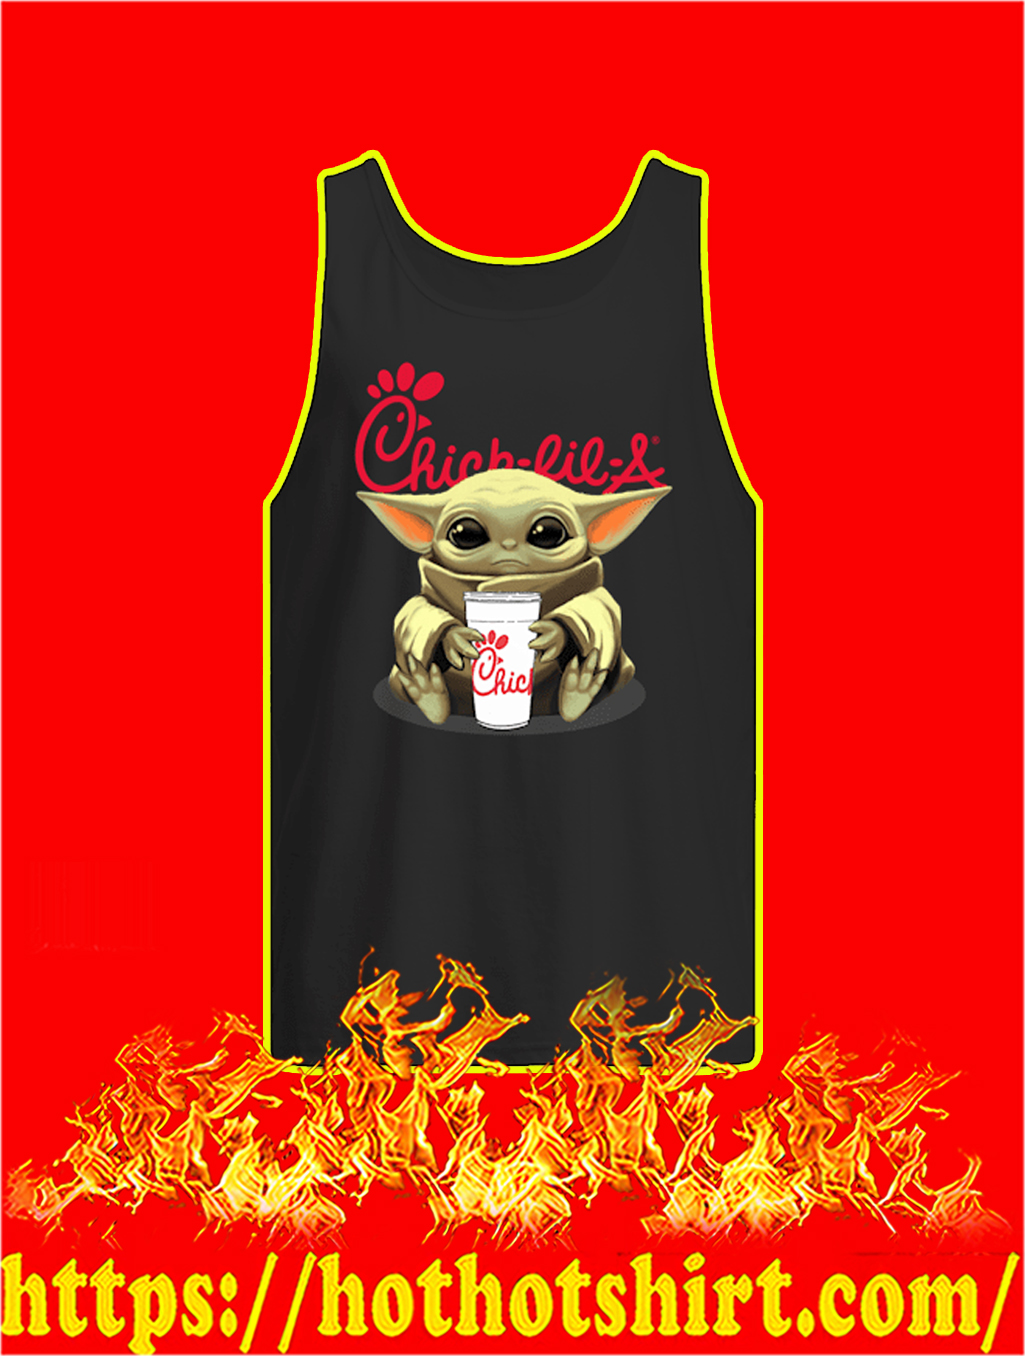 Baby Yoda Hug Chick-fil-A tank top